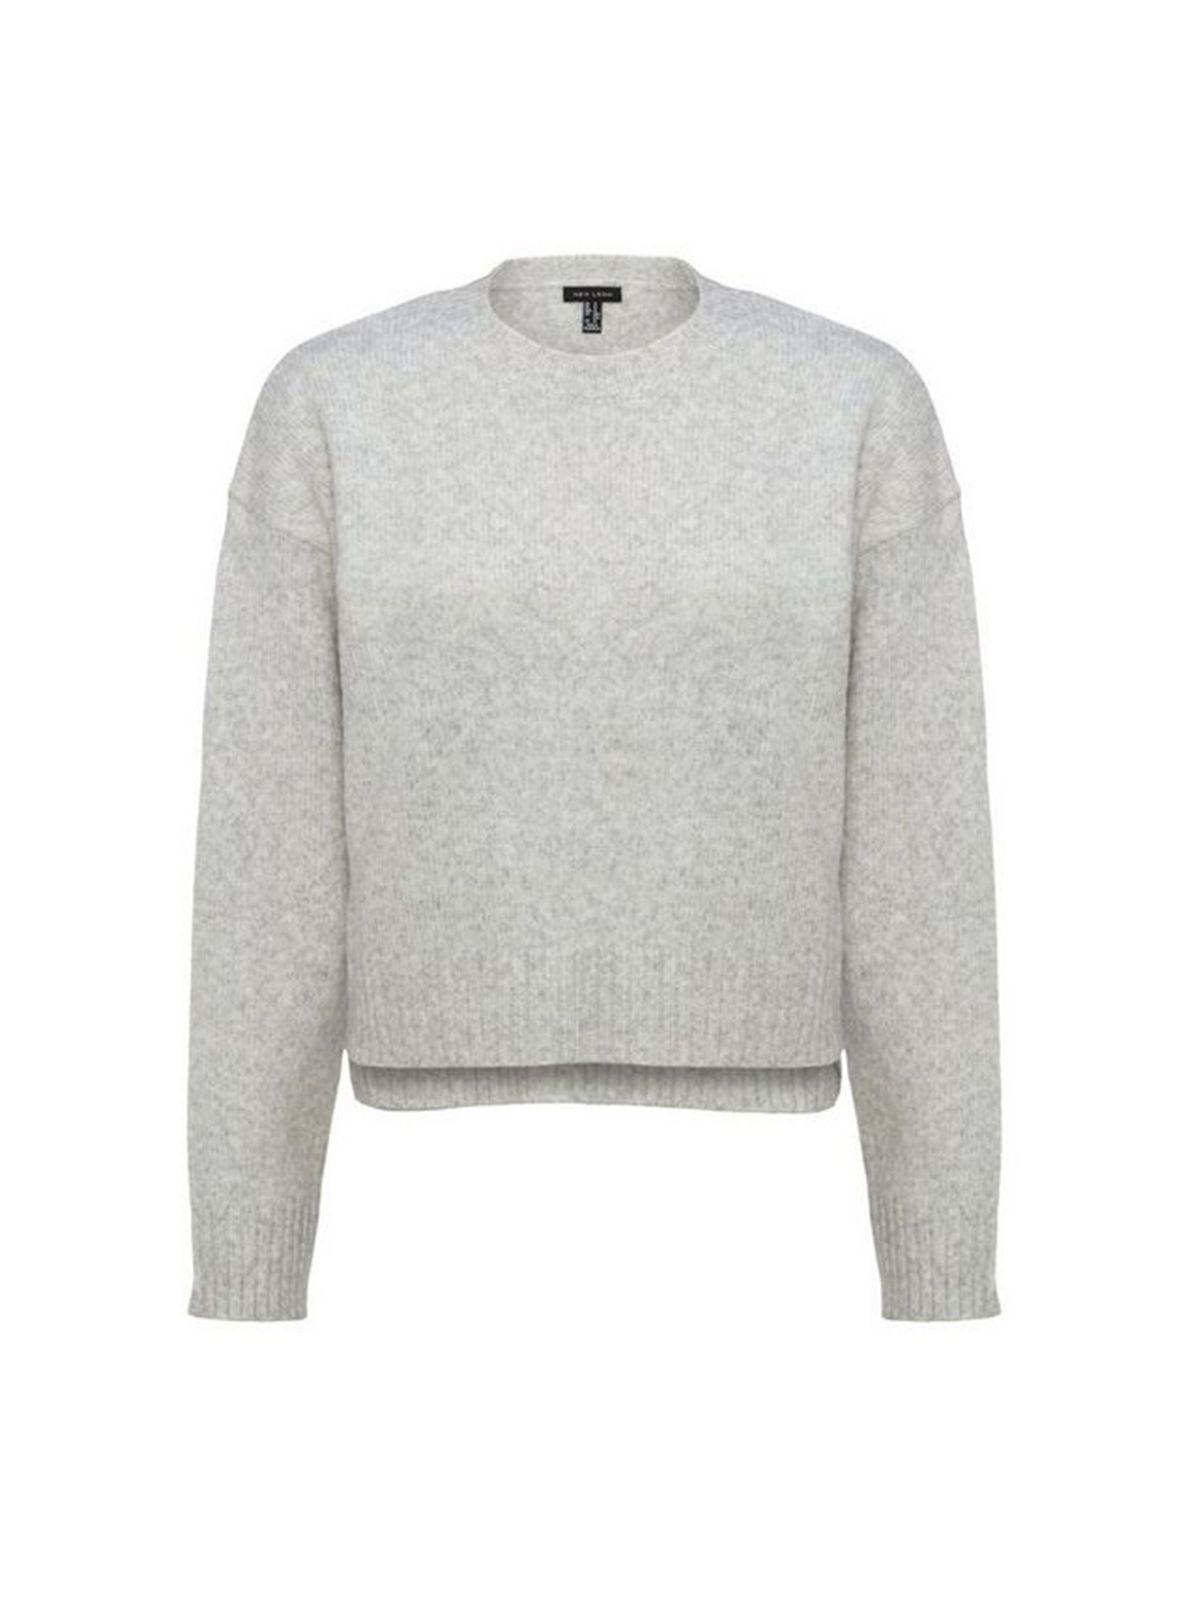 Pale Grey Fine Knit Crew Neck Jumper